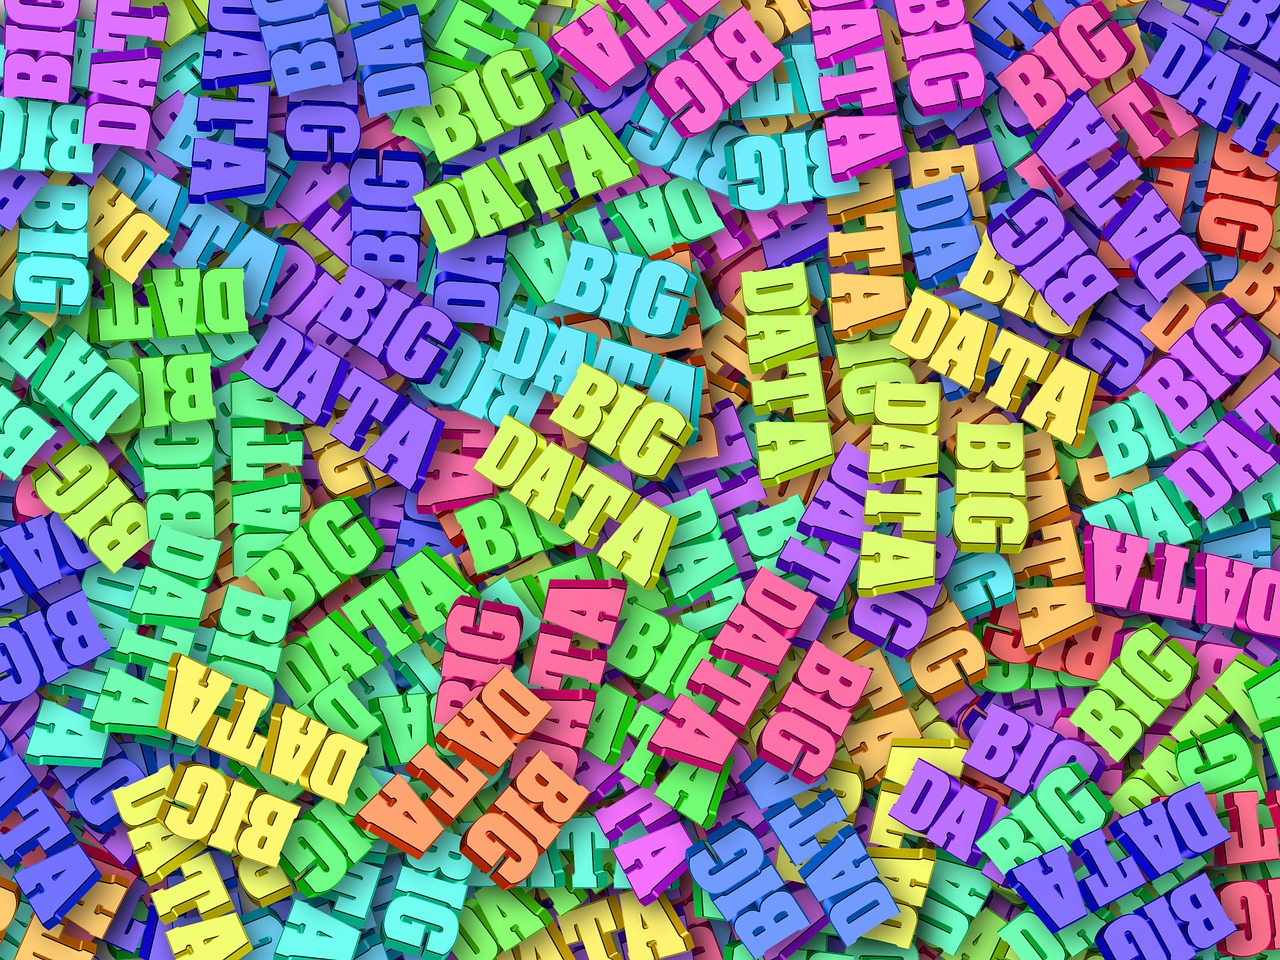 big data analysis strumento